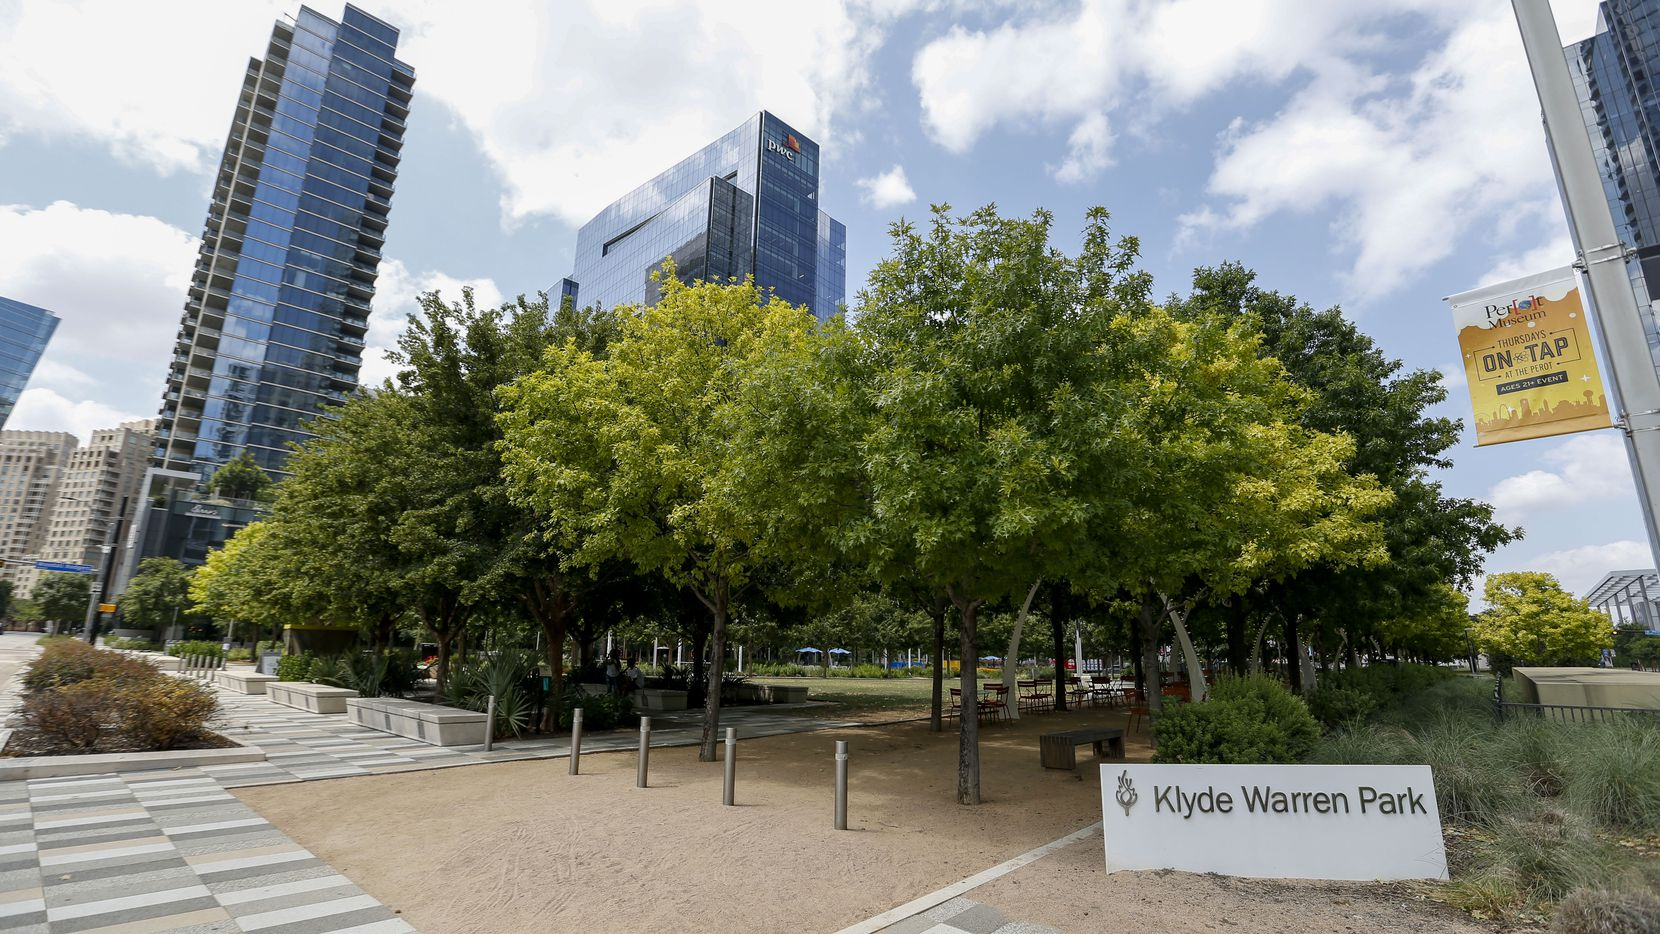 Klyde Warren Park on Wednesday, June 23, 2021, in Dallas. (Elias Valverde II/The Dallas Morning News)